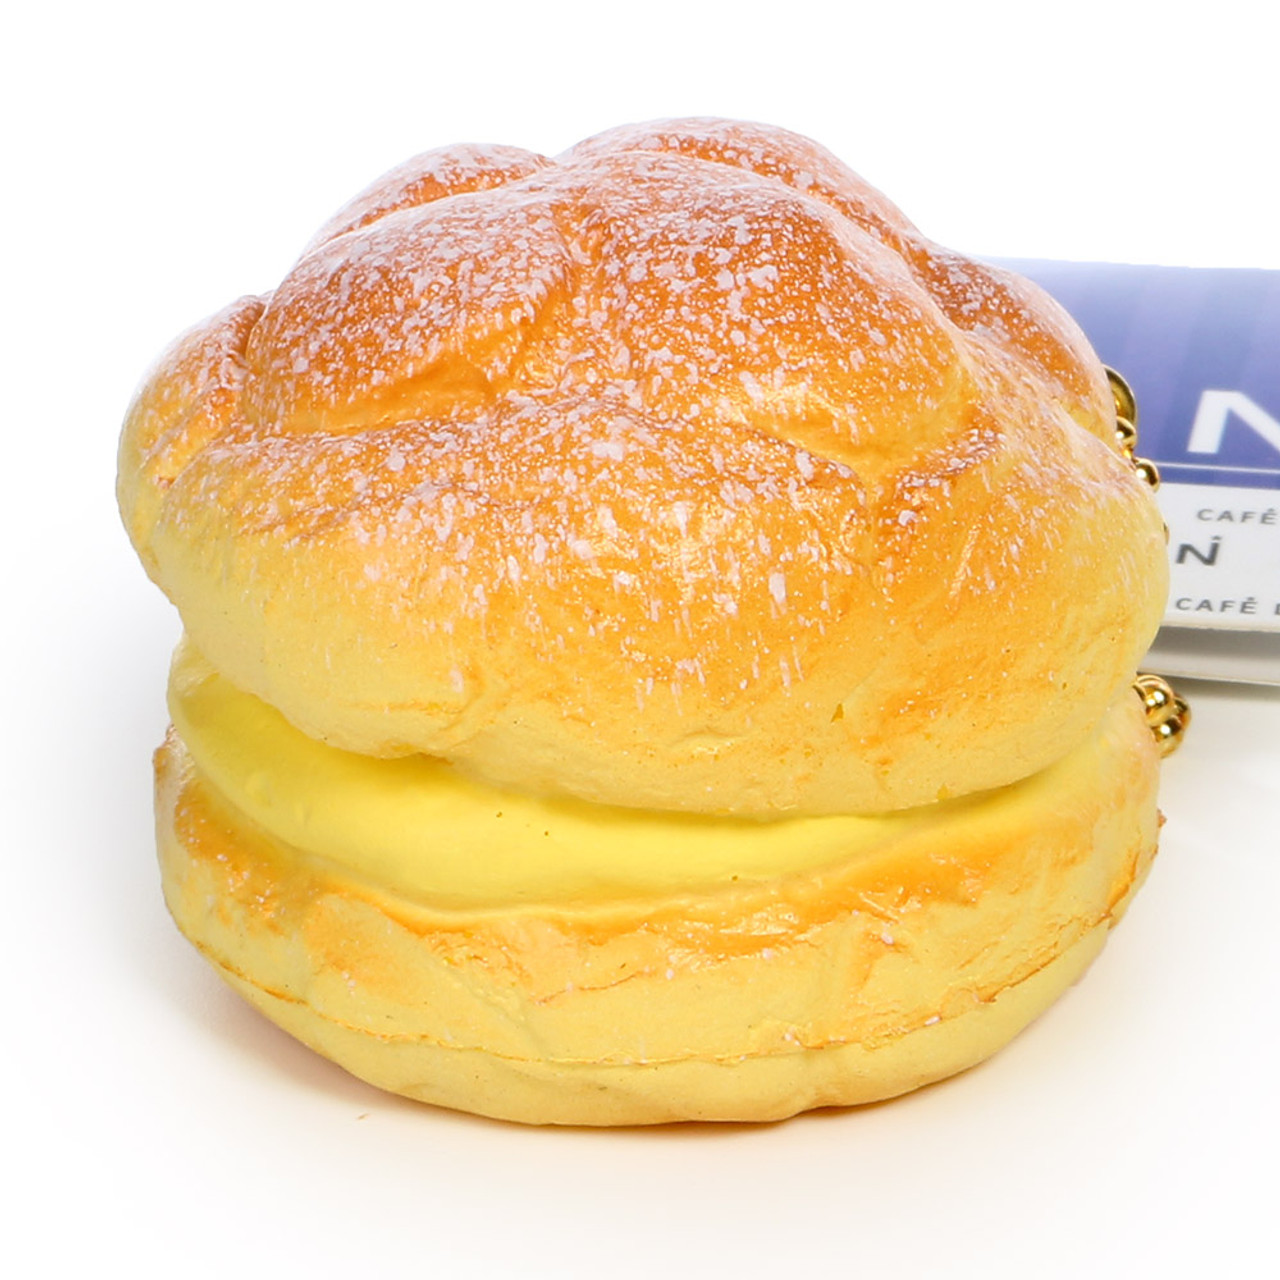 Café De N Custard Cream Puff Dessert Squishy Toy Cellphone Charms ( 45 Degree Angle )